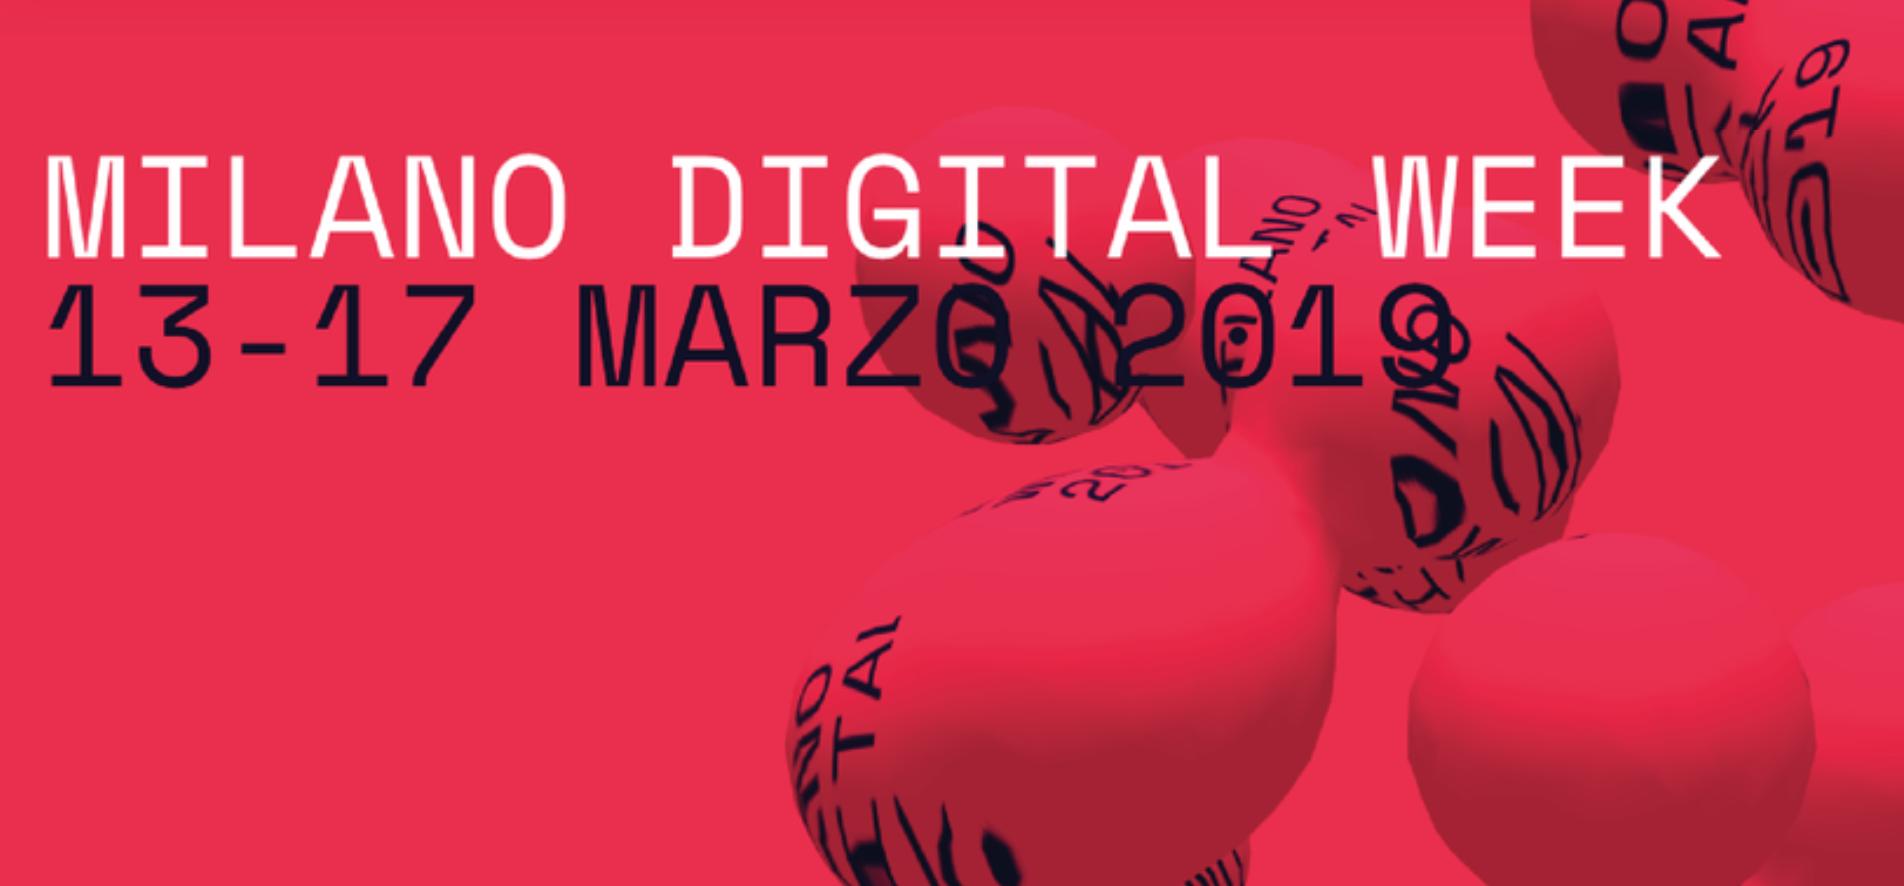 Milano Digital Week: la tavola si fa intelligente grazie alle Digital Dinner thumbnail